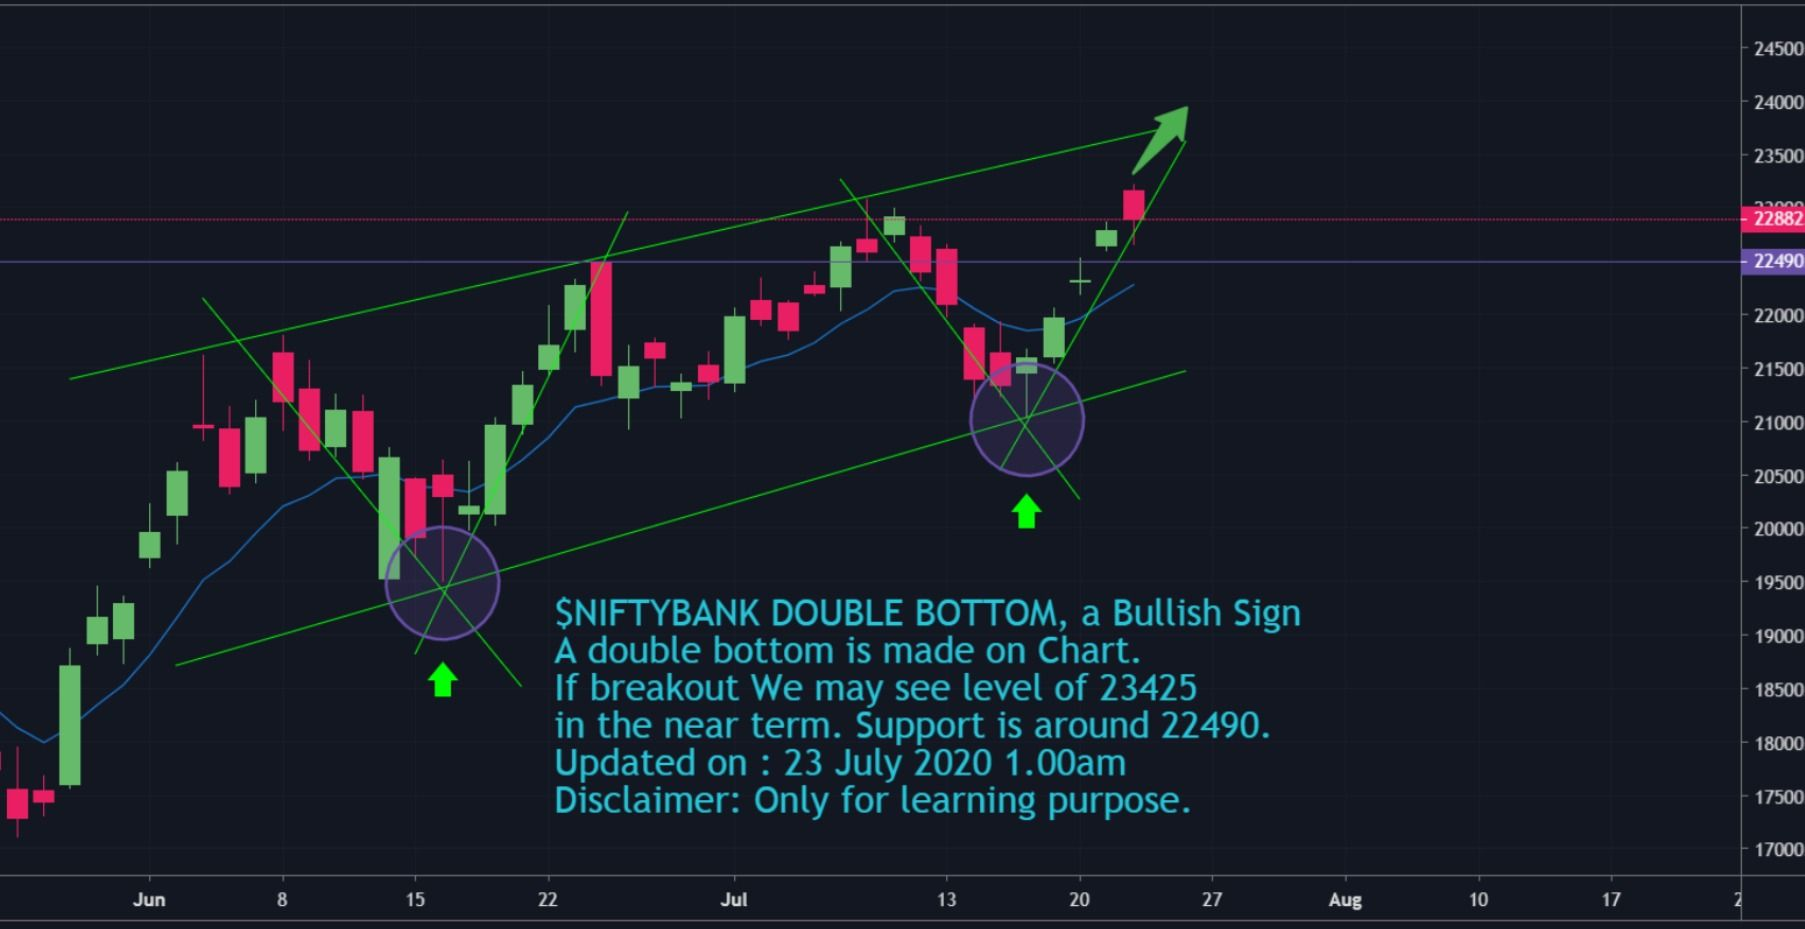 Banknifty double bottom bullish sign in 2020 stock